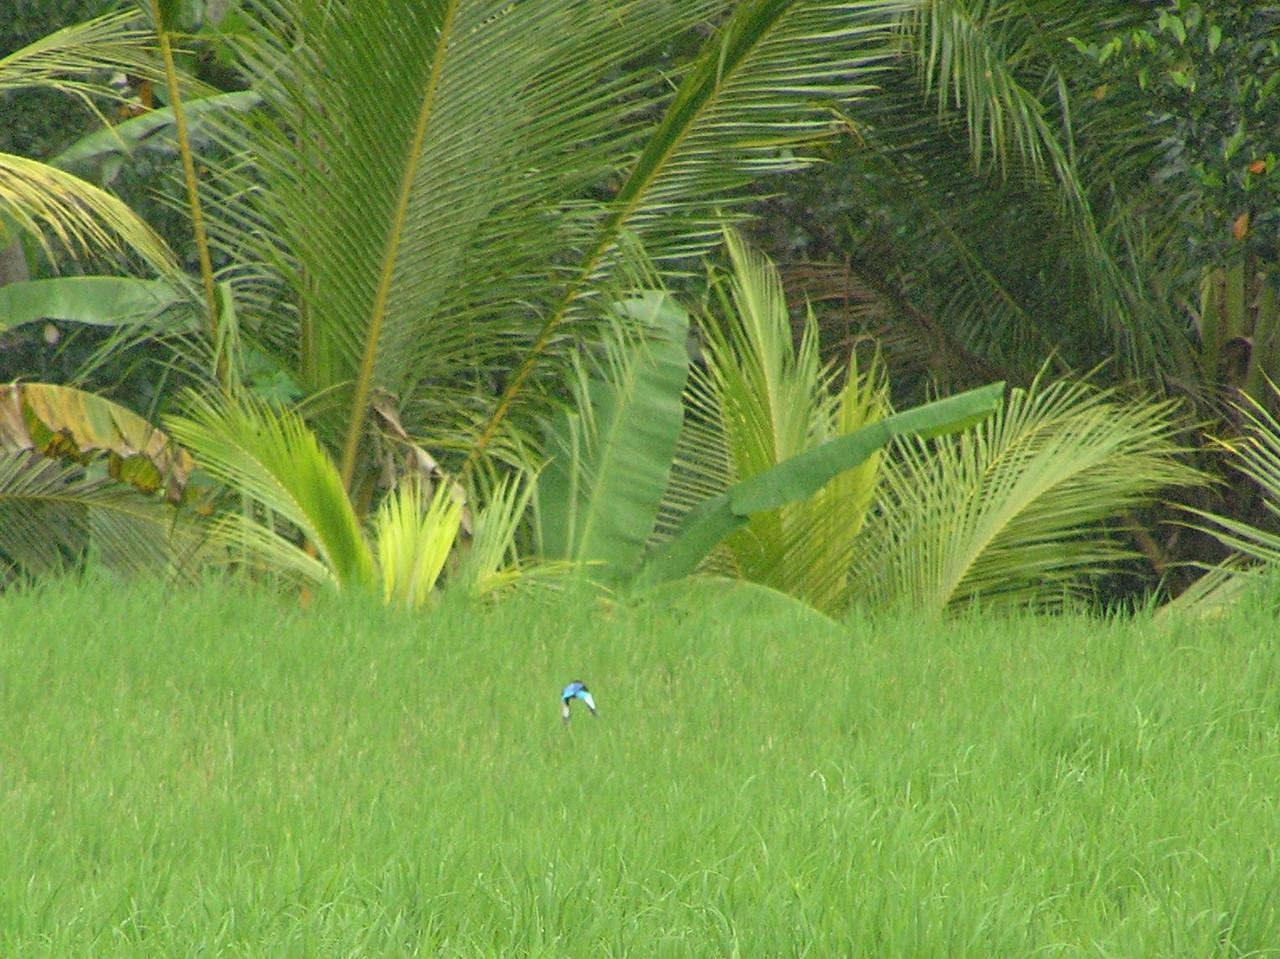 java kingfisher in flight bali aug 2010